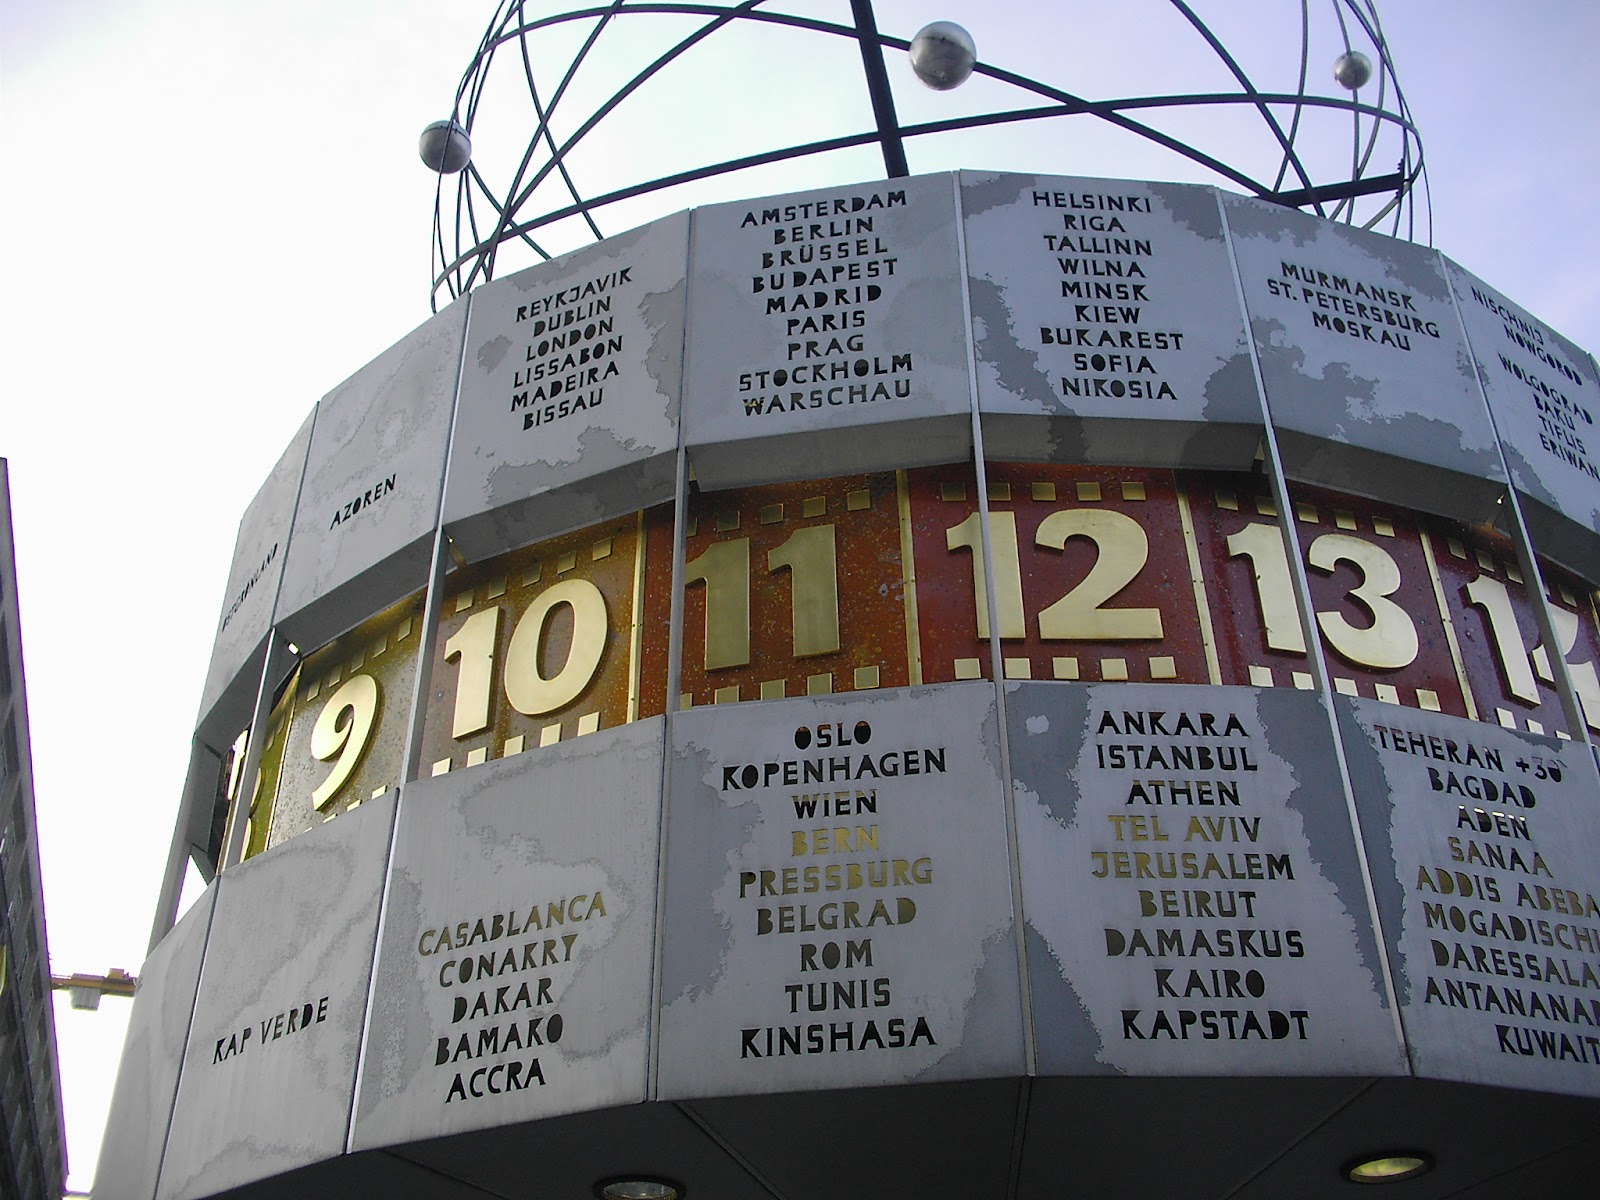 Panorama (2003-2005)